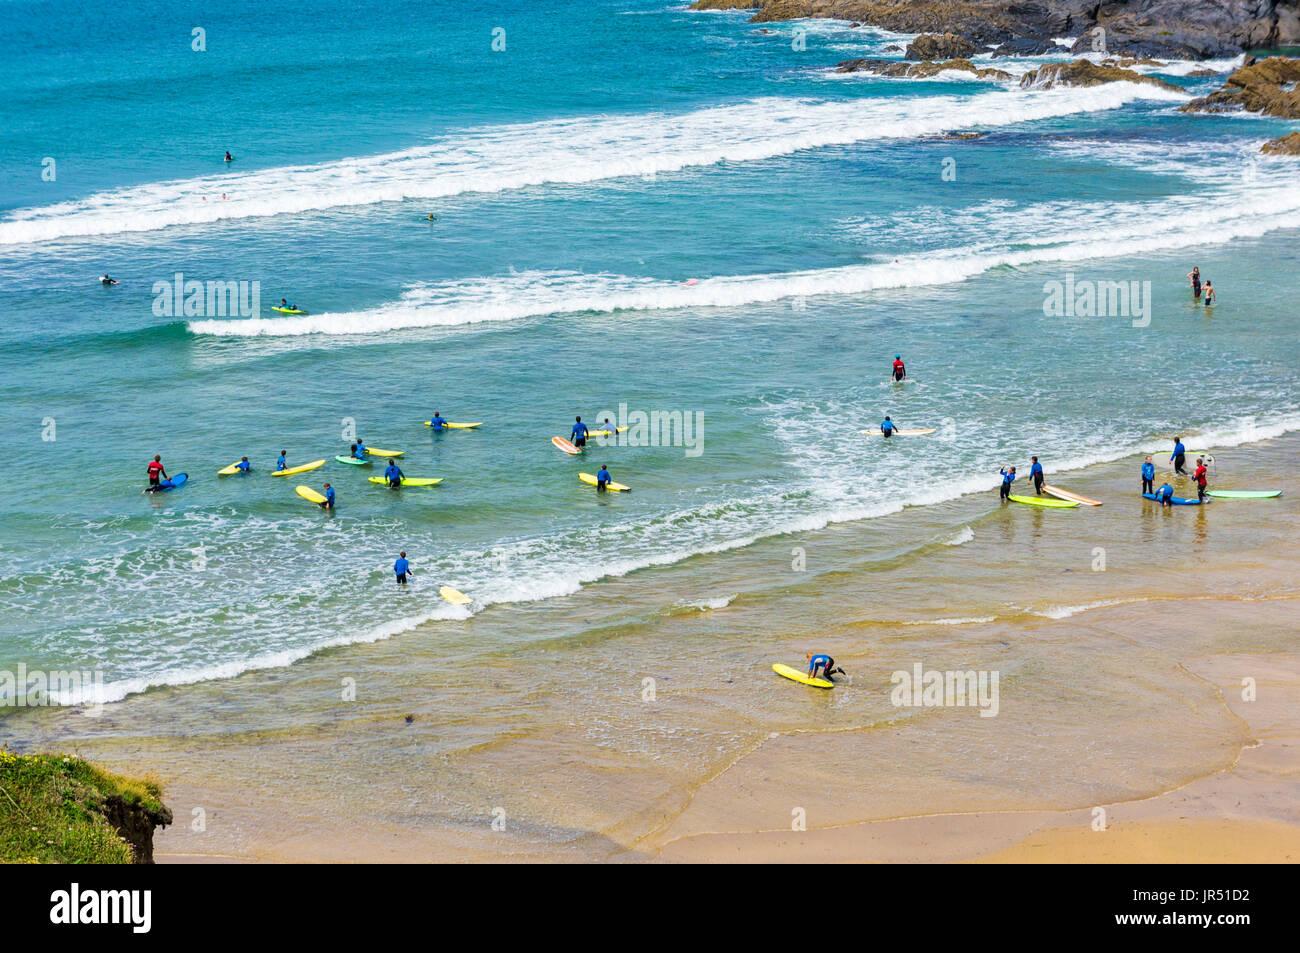 Surfing school at Poldhu Cove beach, Lizard Peninsula, Cornwall, UK - Stock Image